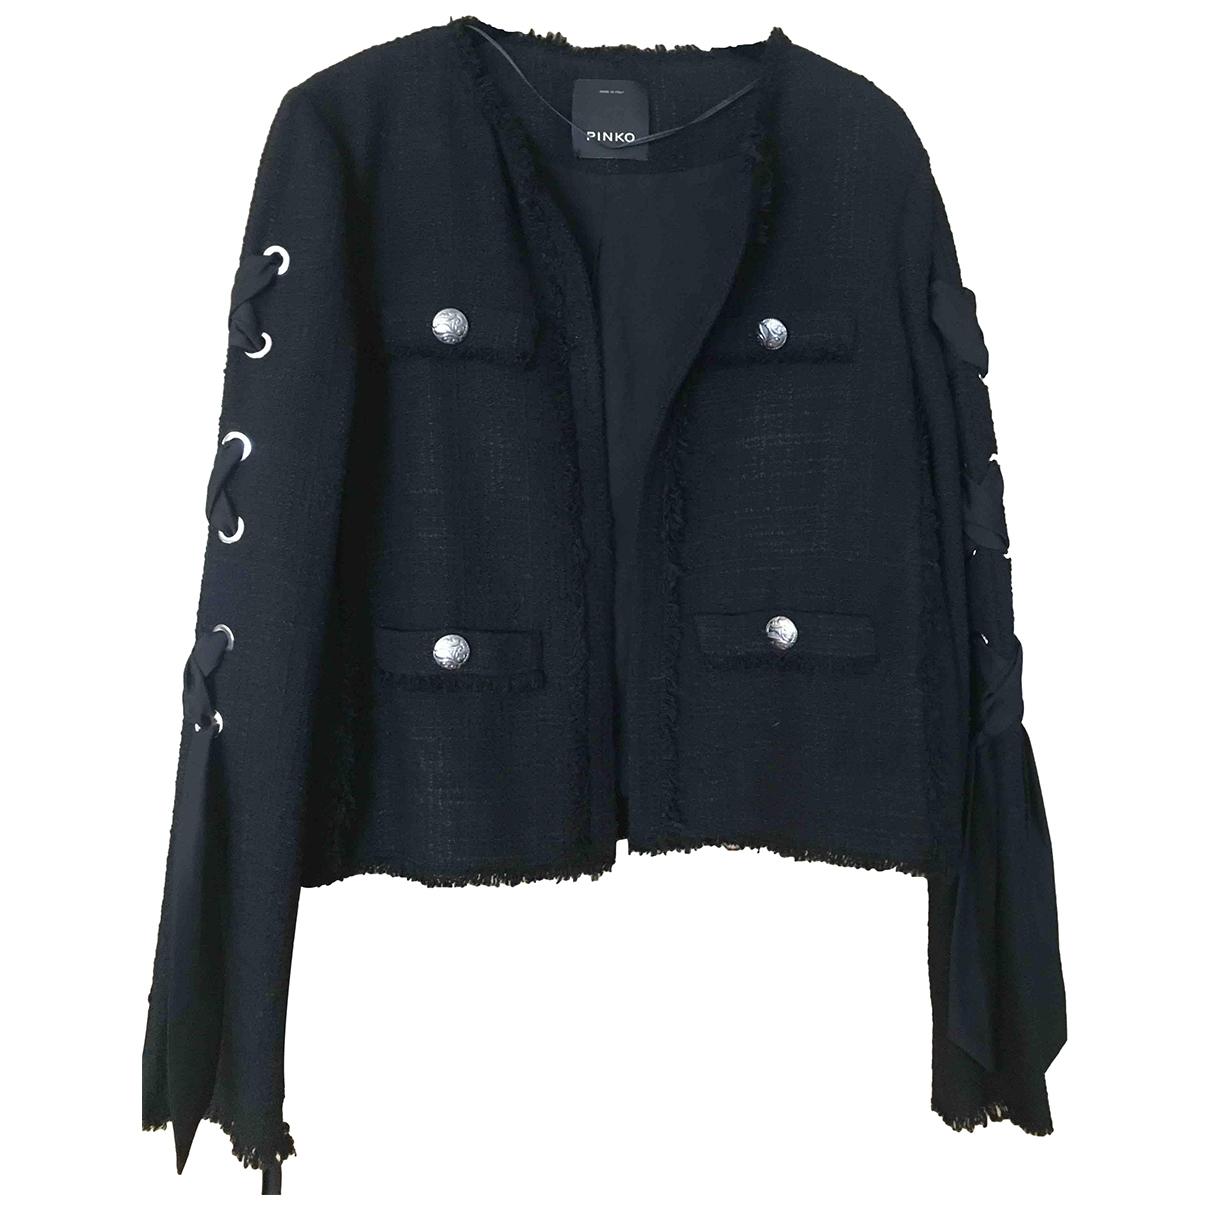 Pinko \N Black Cotton jacket for Women 38 FR